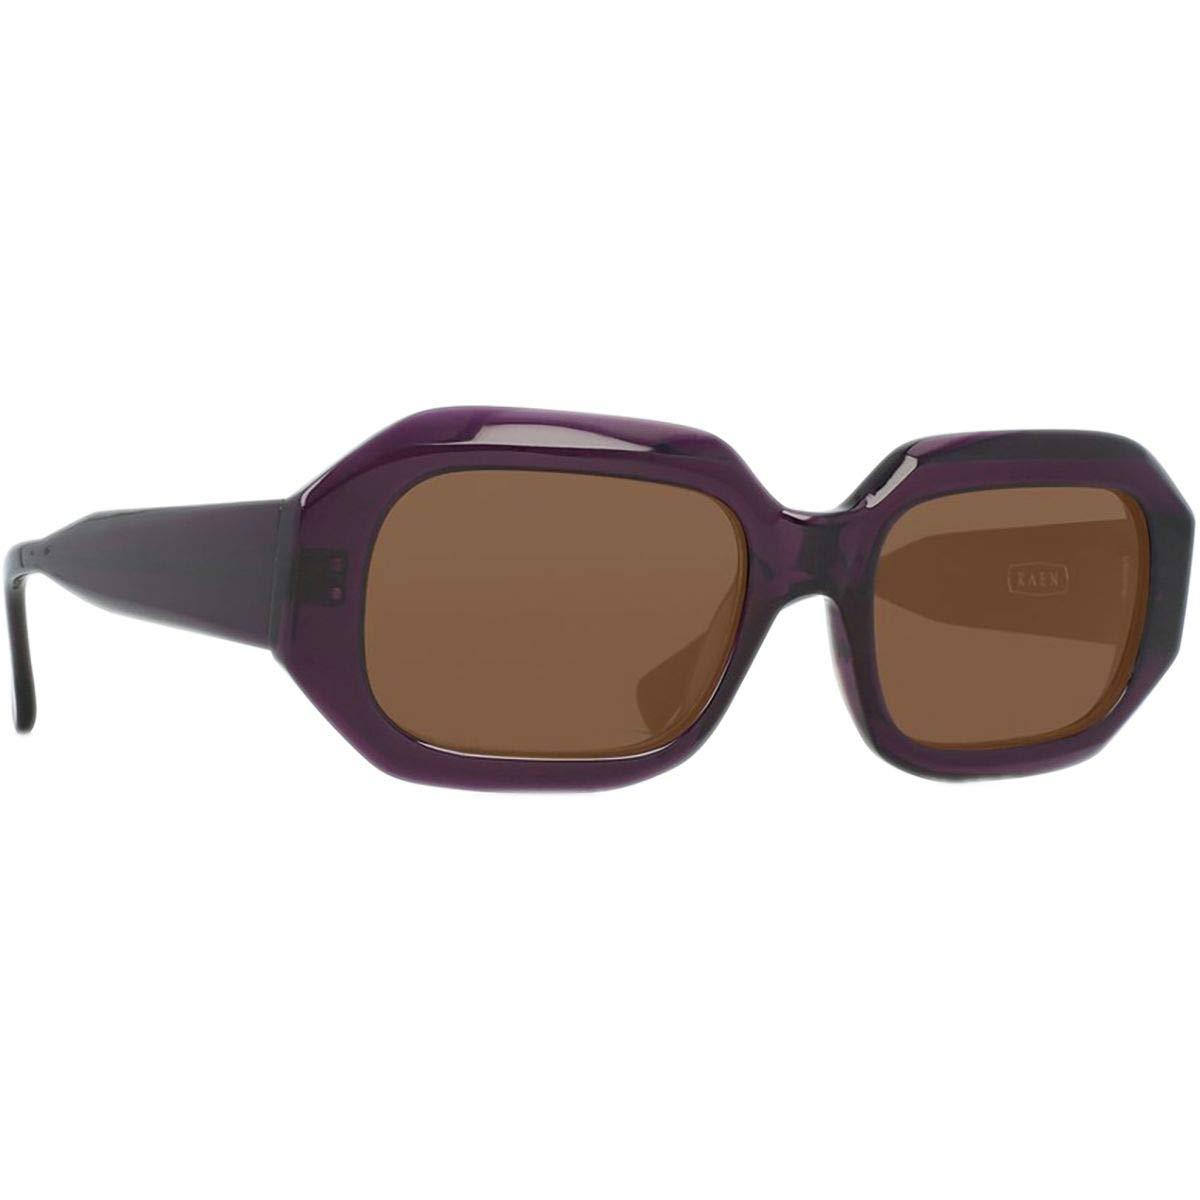 RAEN optics Sill Sunglasses